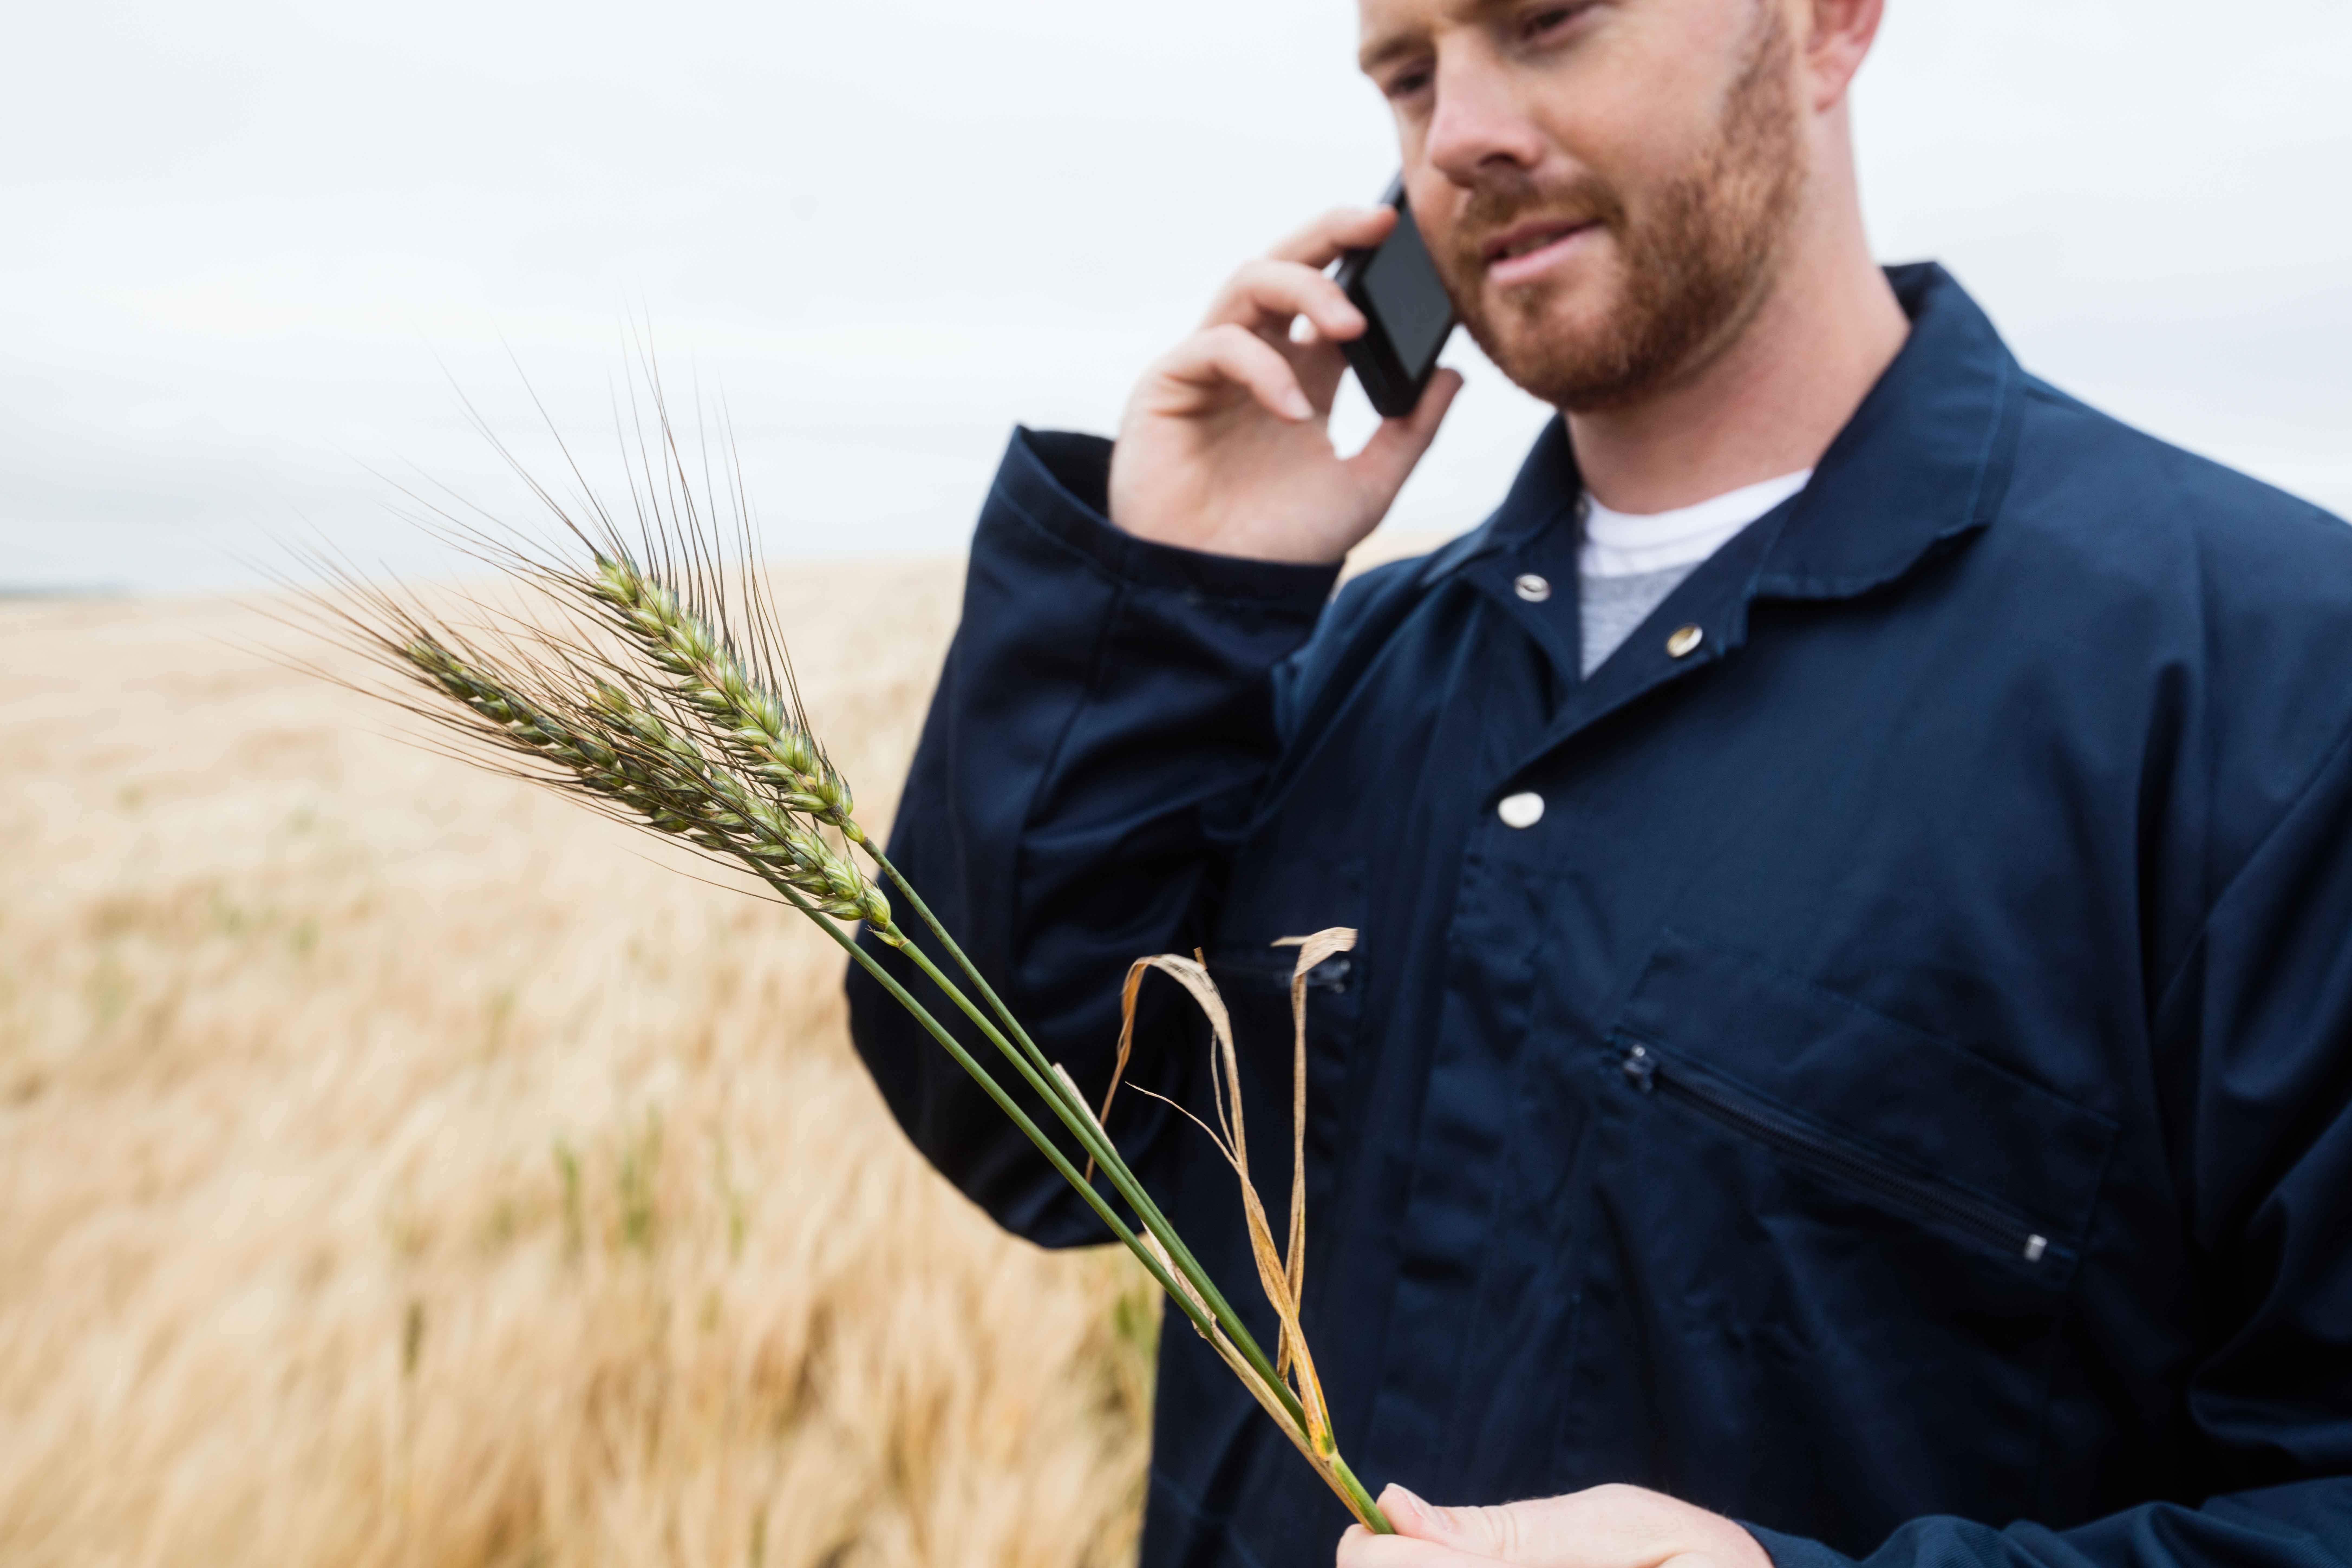 Agronomist_on_phone